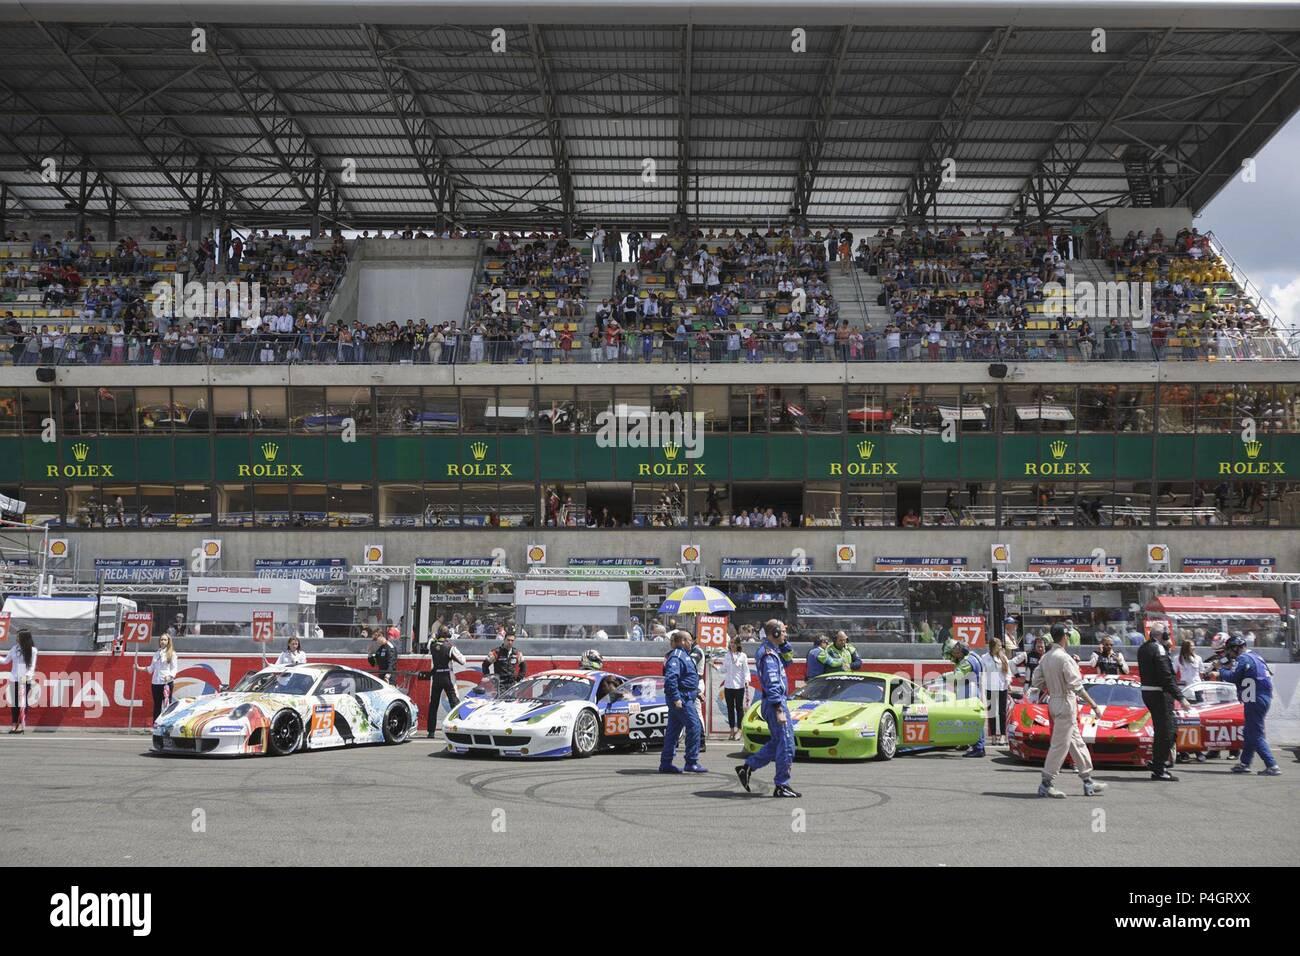 Arthur Bonnet Le Mans steve mckenna stock photos & steve mckenna stock images - alamy